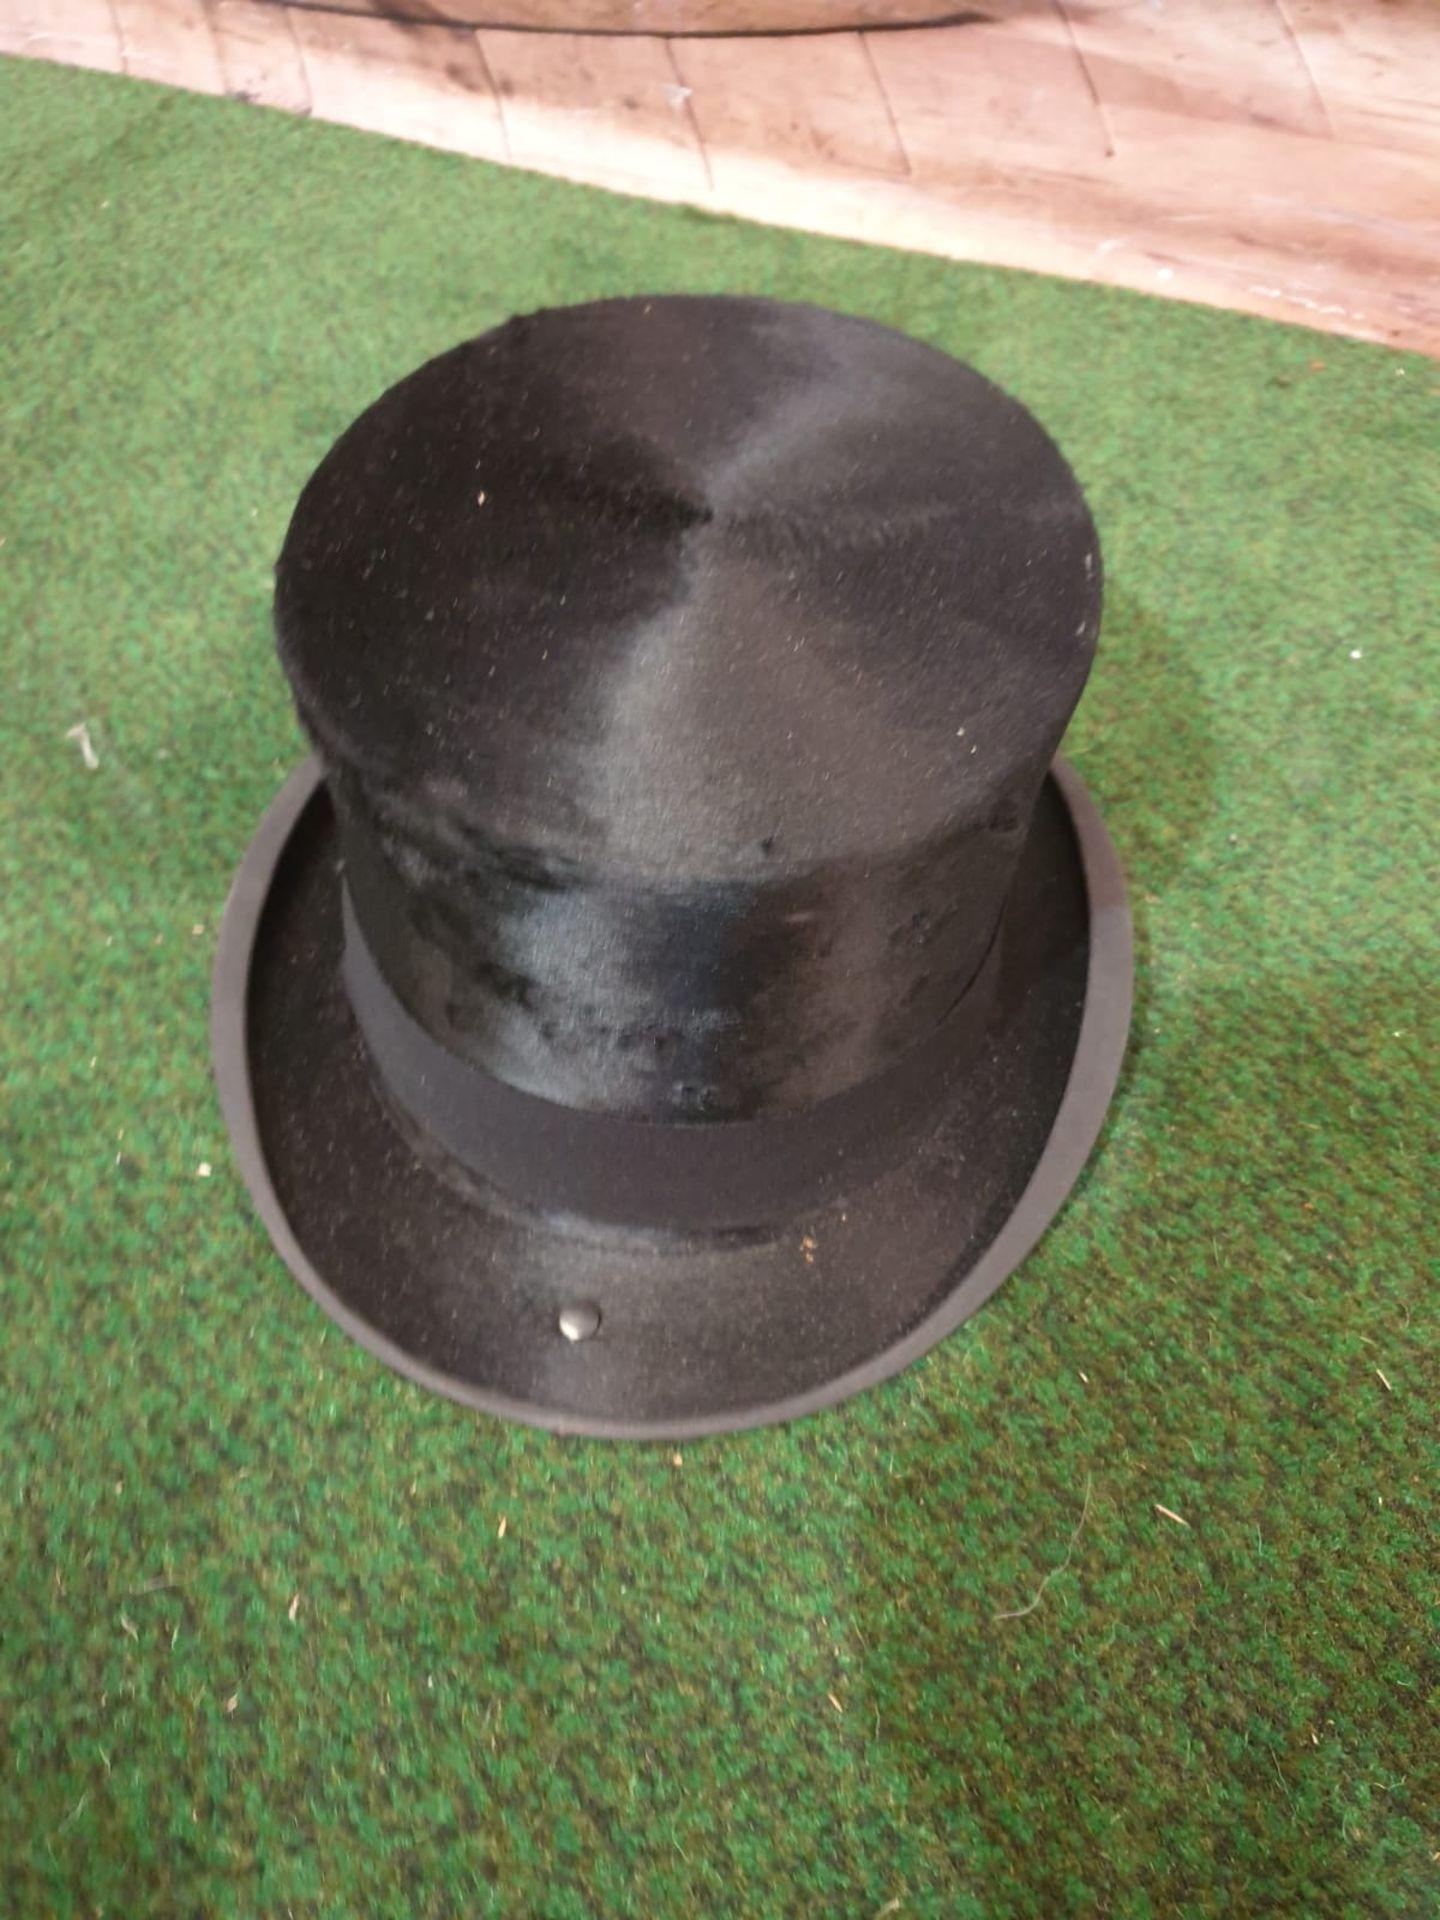 A James Lock + Co. Silk Black Top hat with original card box